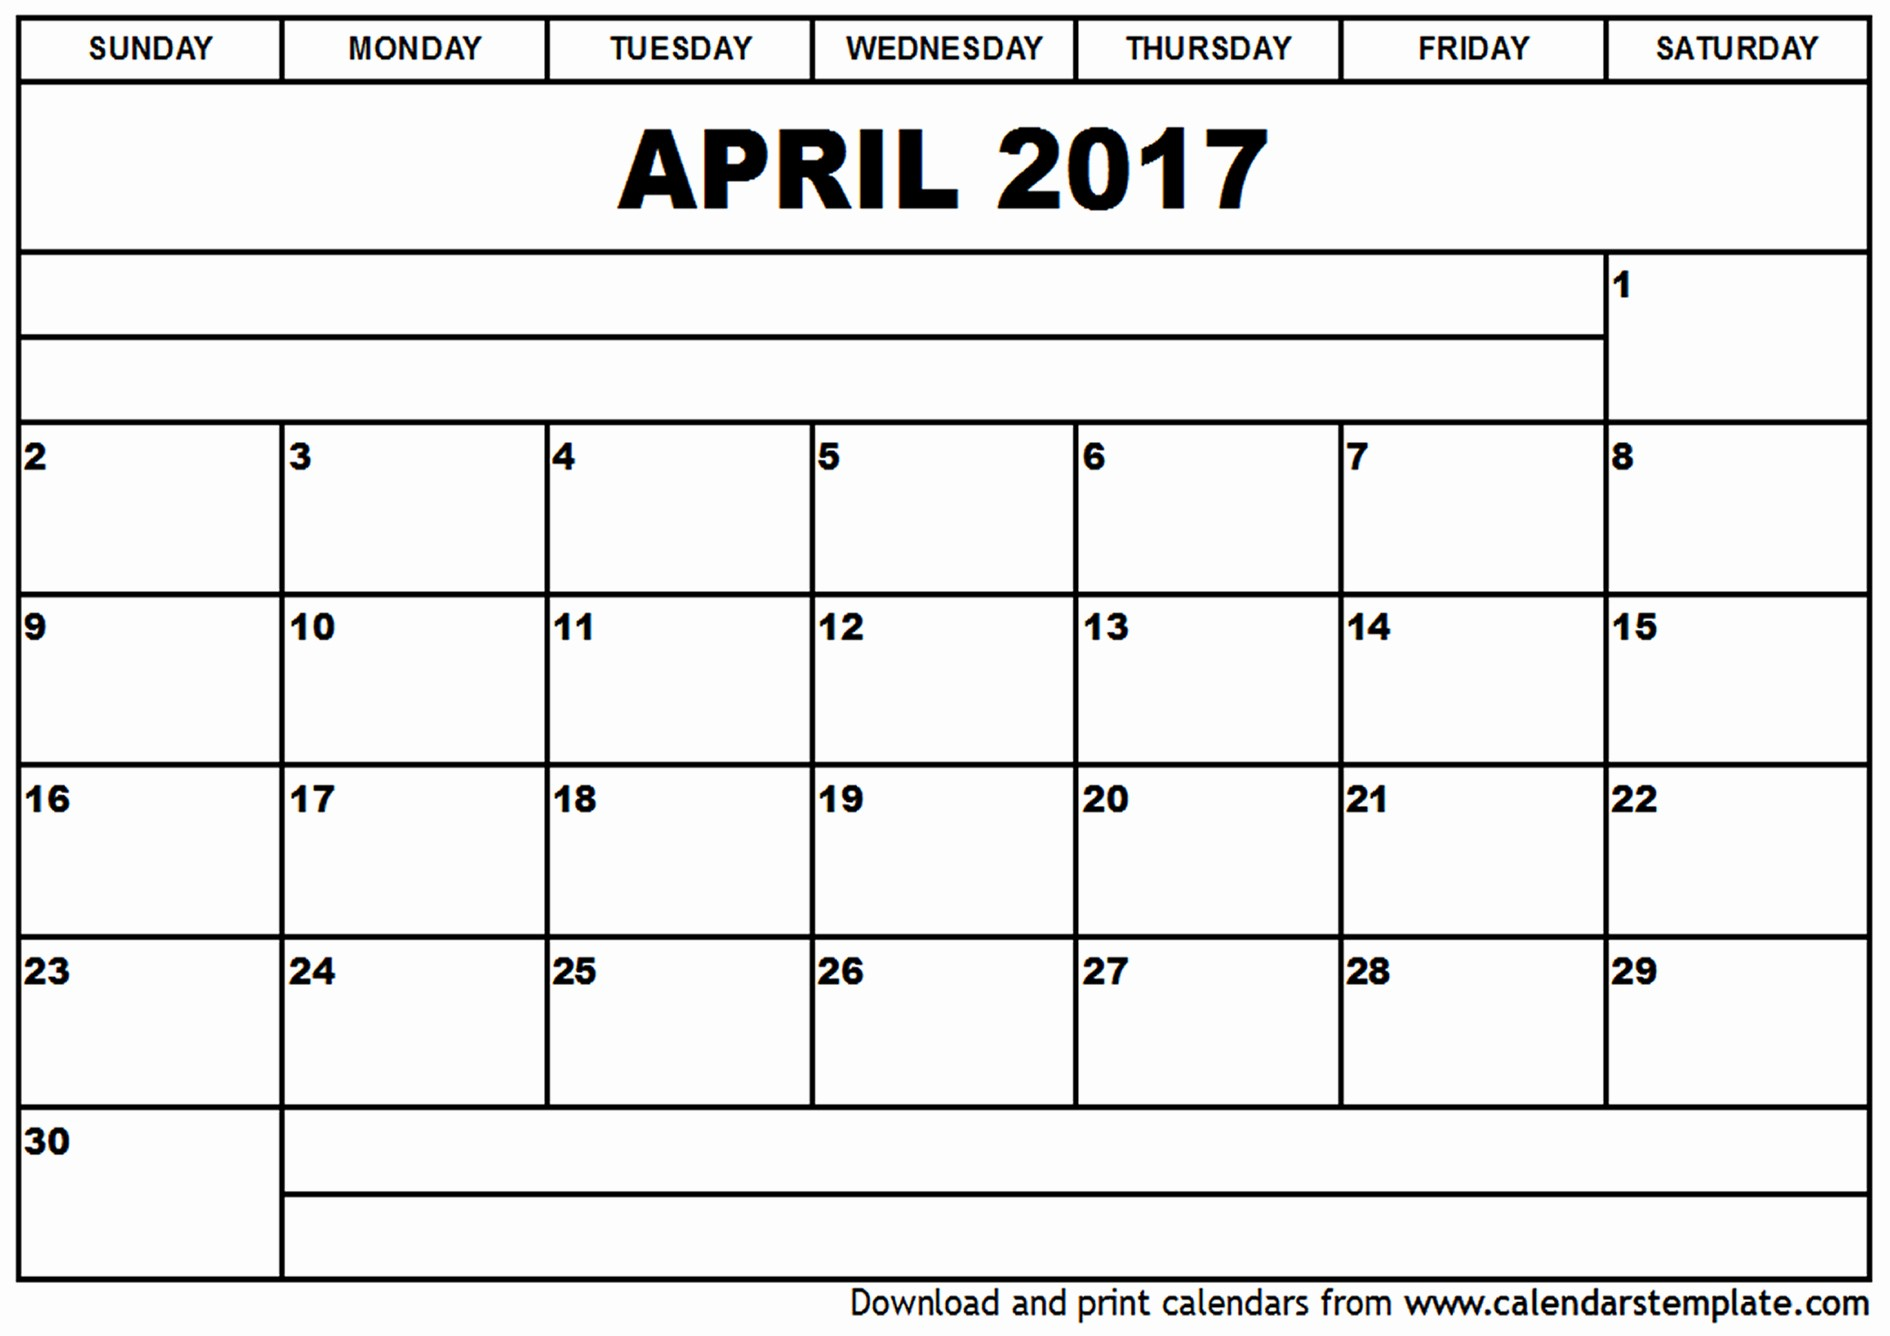 3 Month Calendar 2016 Template New Free Three Month Printable Calendar 2016